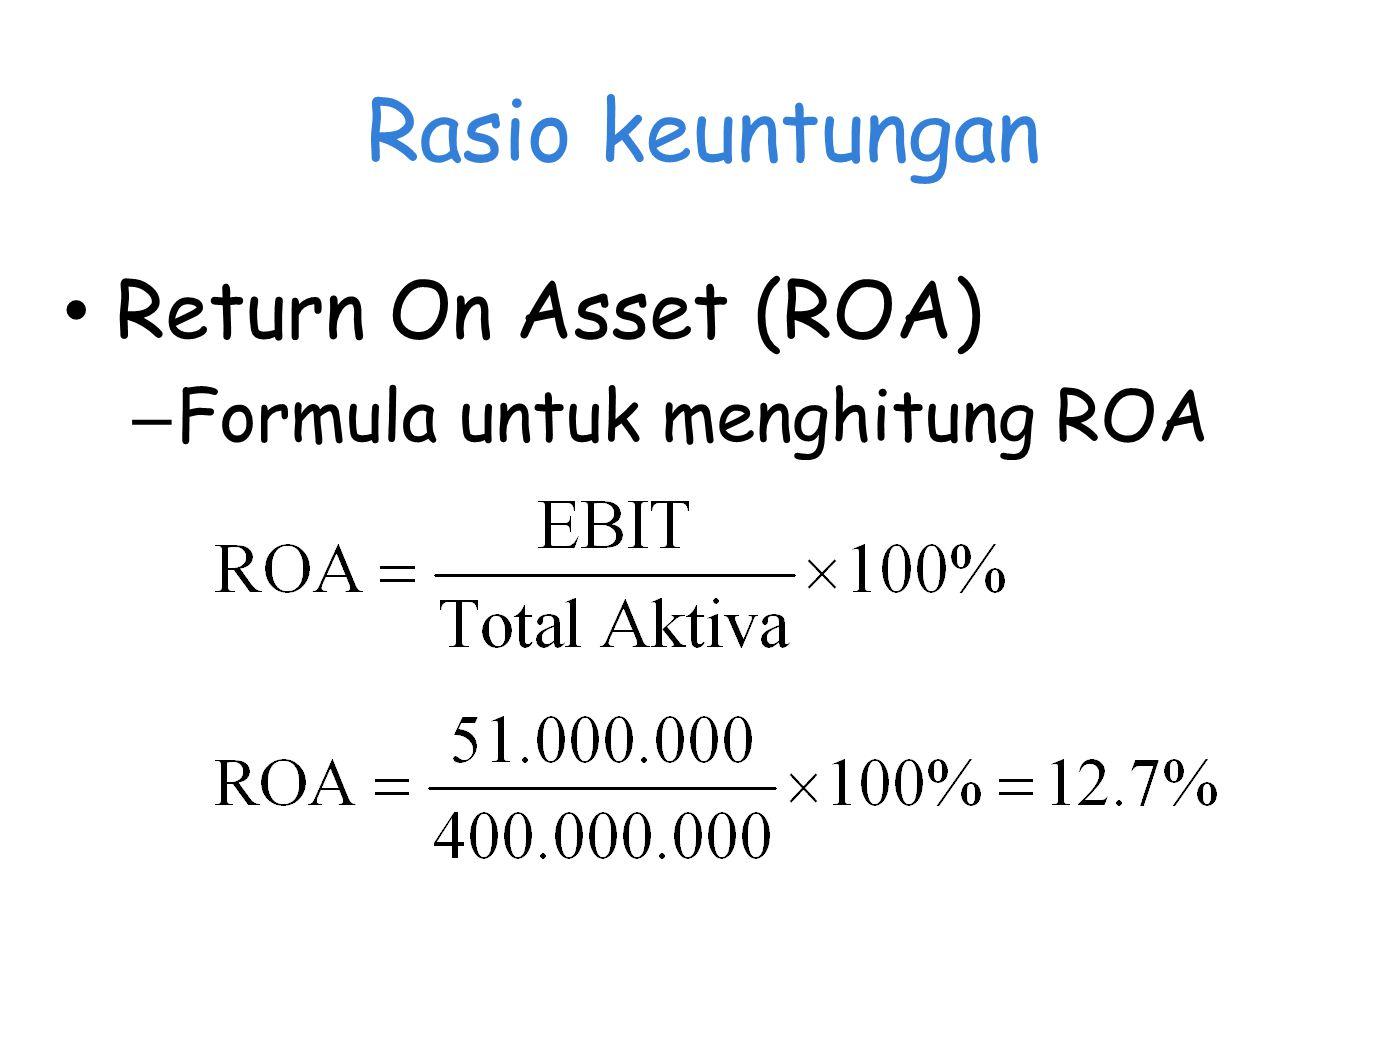 Rasio keuntungan Return On Asset (ROA) Formula untuk menghitung ROA